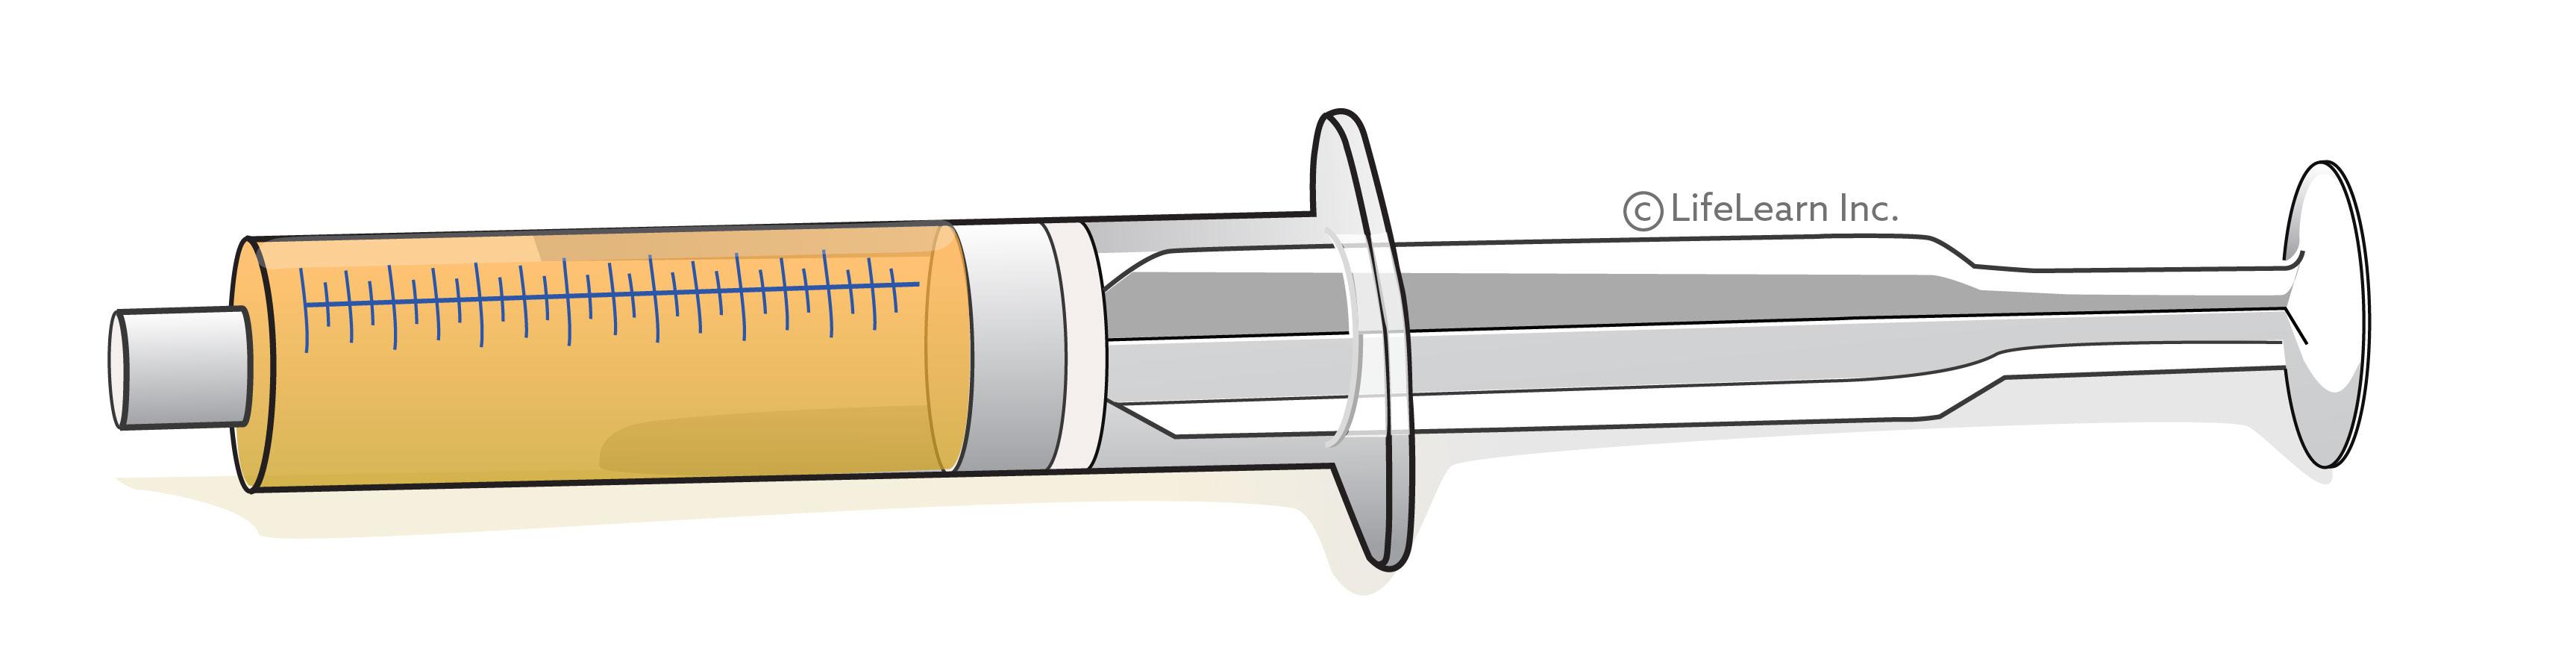 syringe_abdominal_tap_fluid_2018_db-01